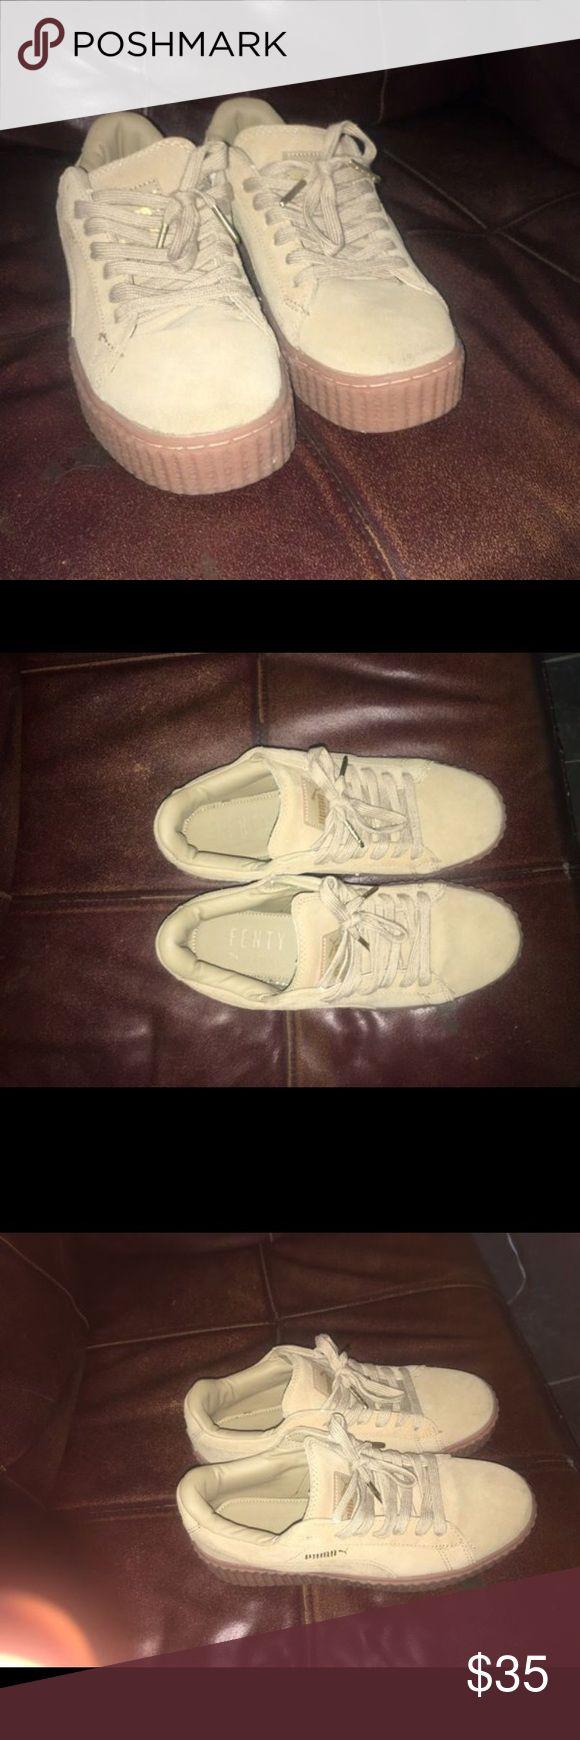 Rihanna Fenty Sneakers Rihanna Puma Sneakers Fenty Puma Shoes Sneakers